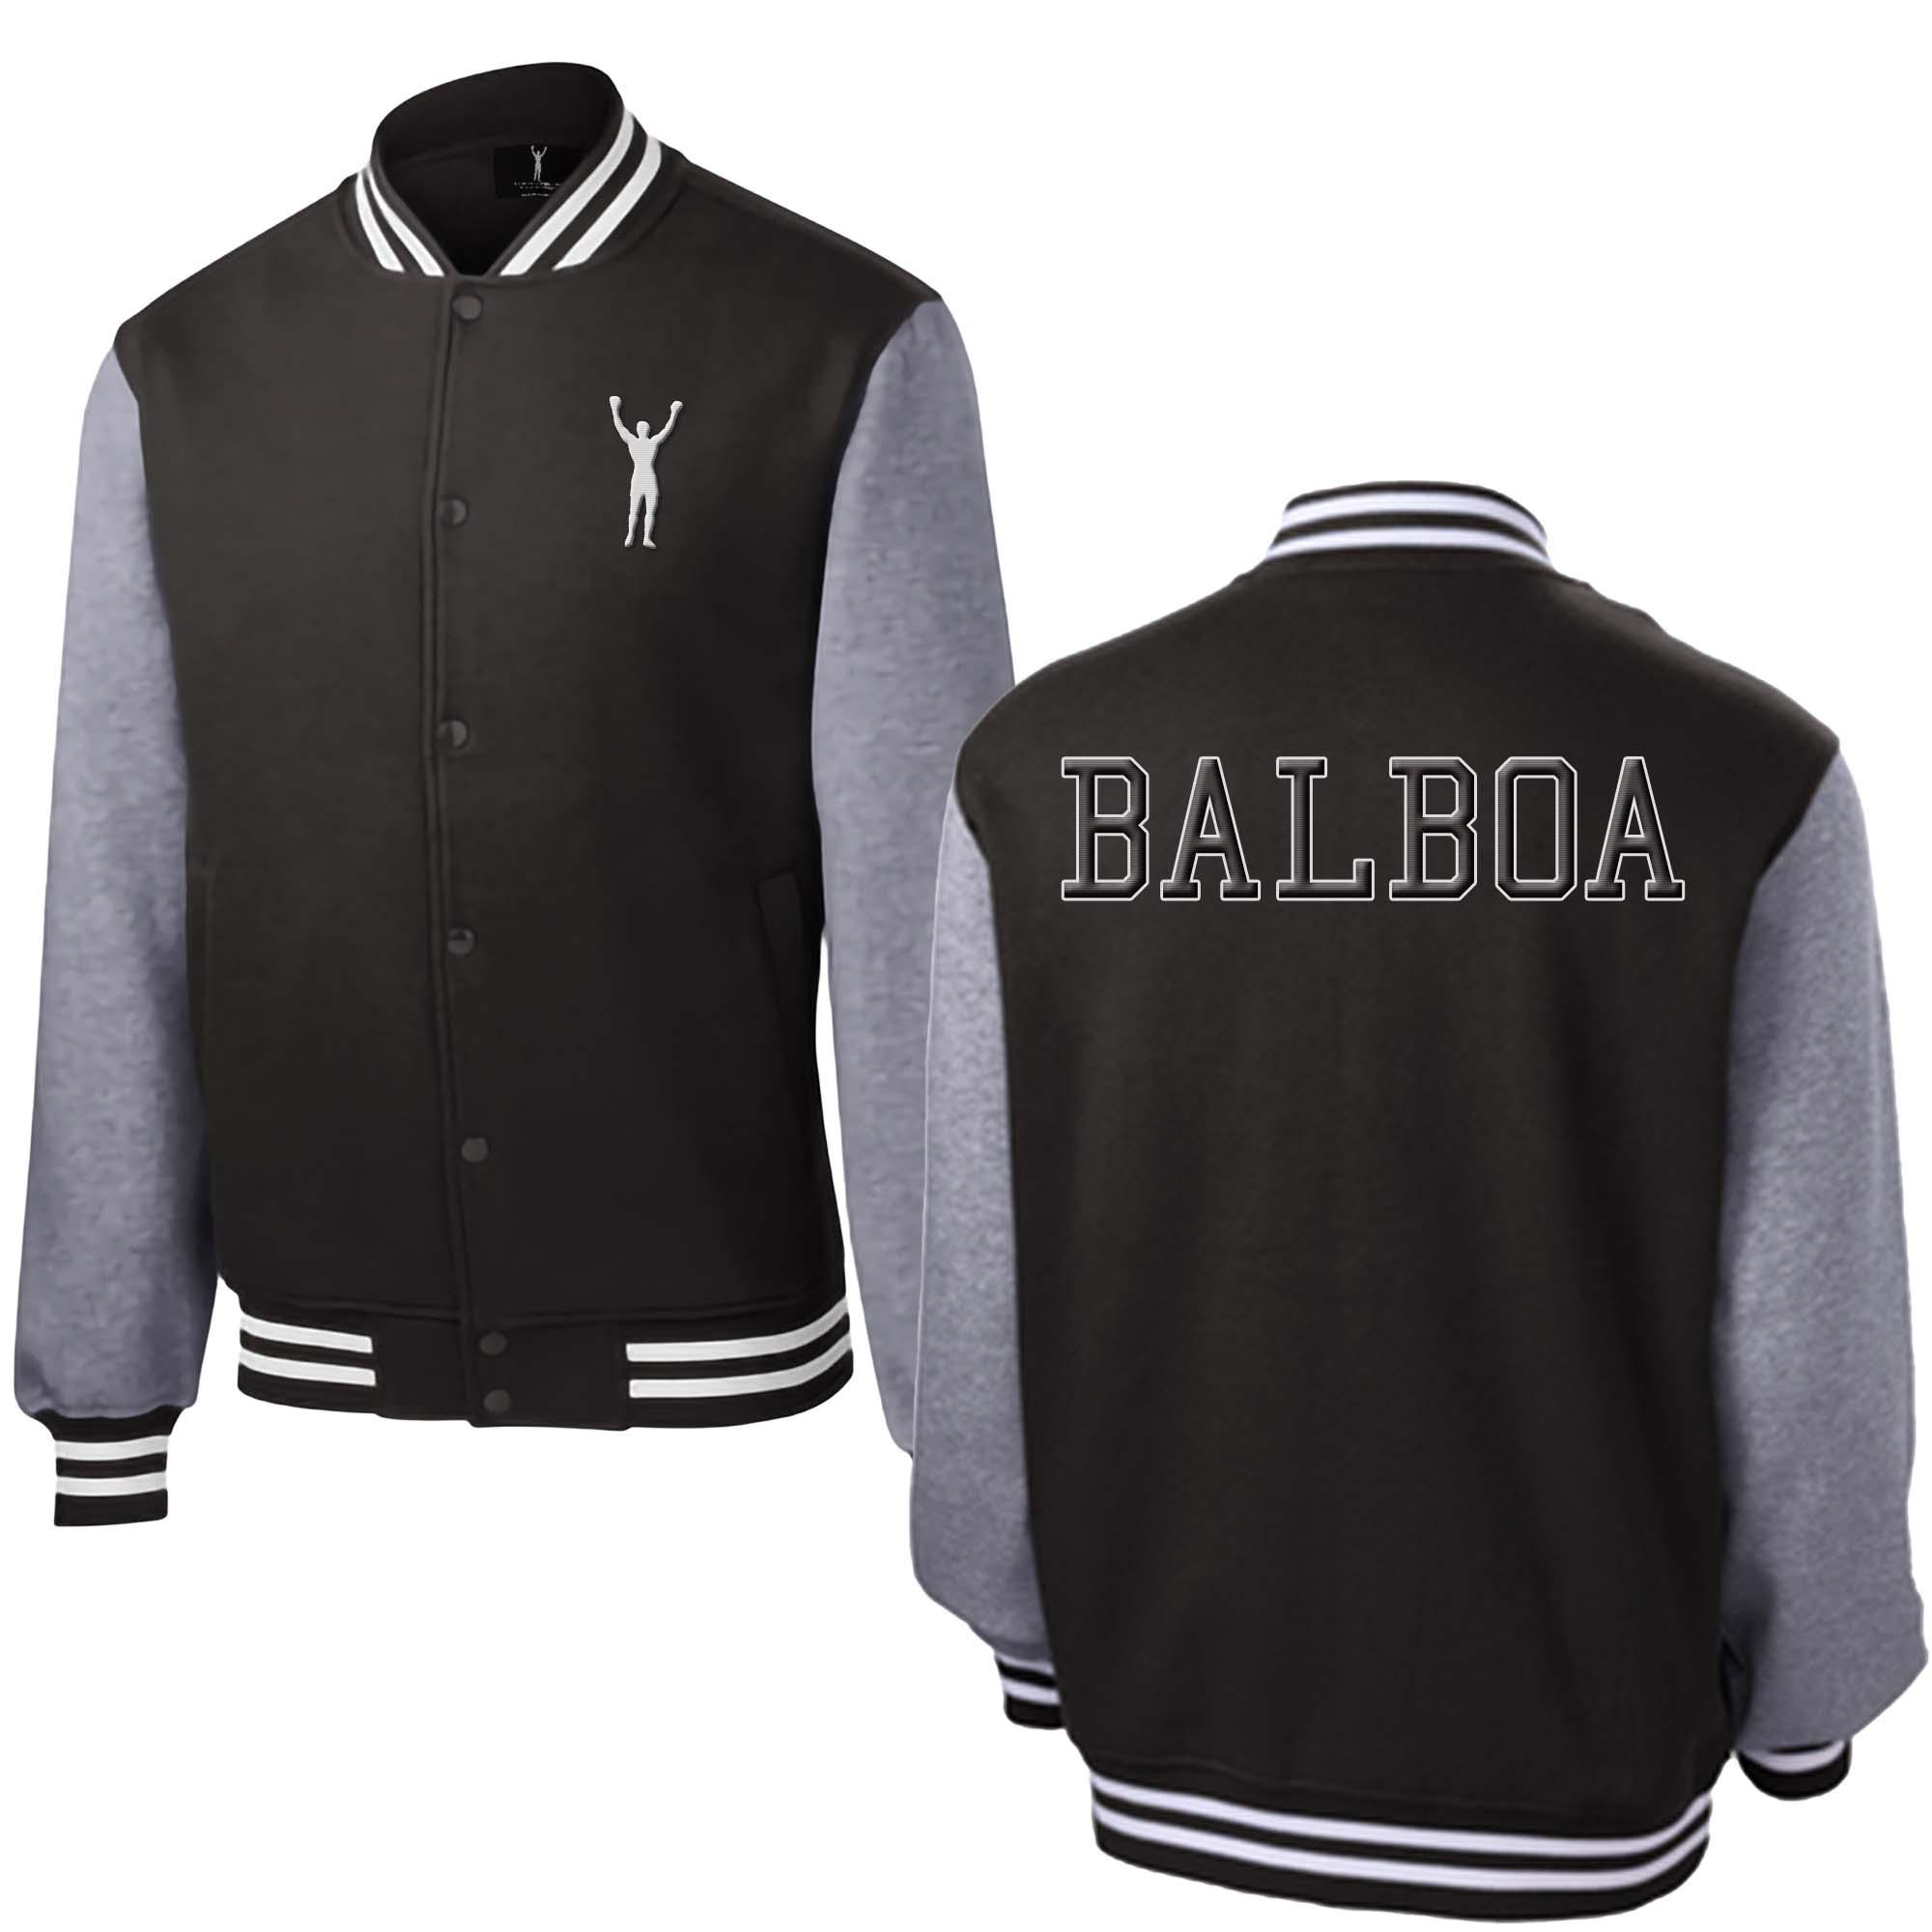 BALBOA Letterman Jacket